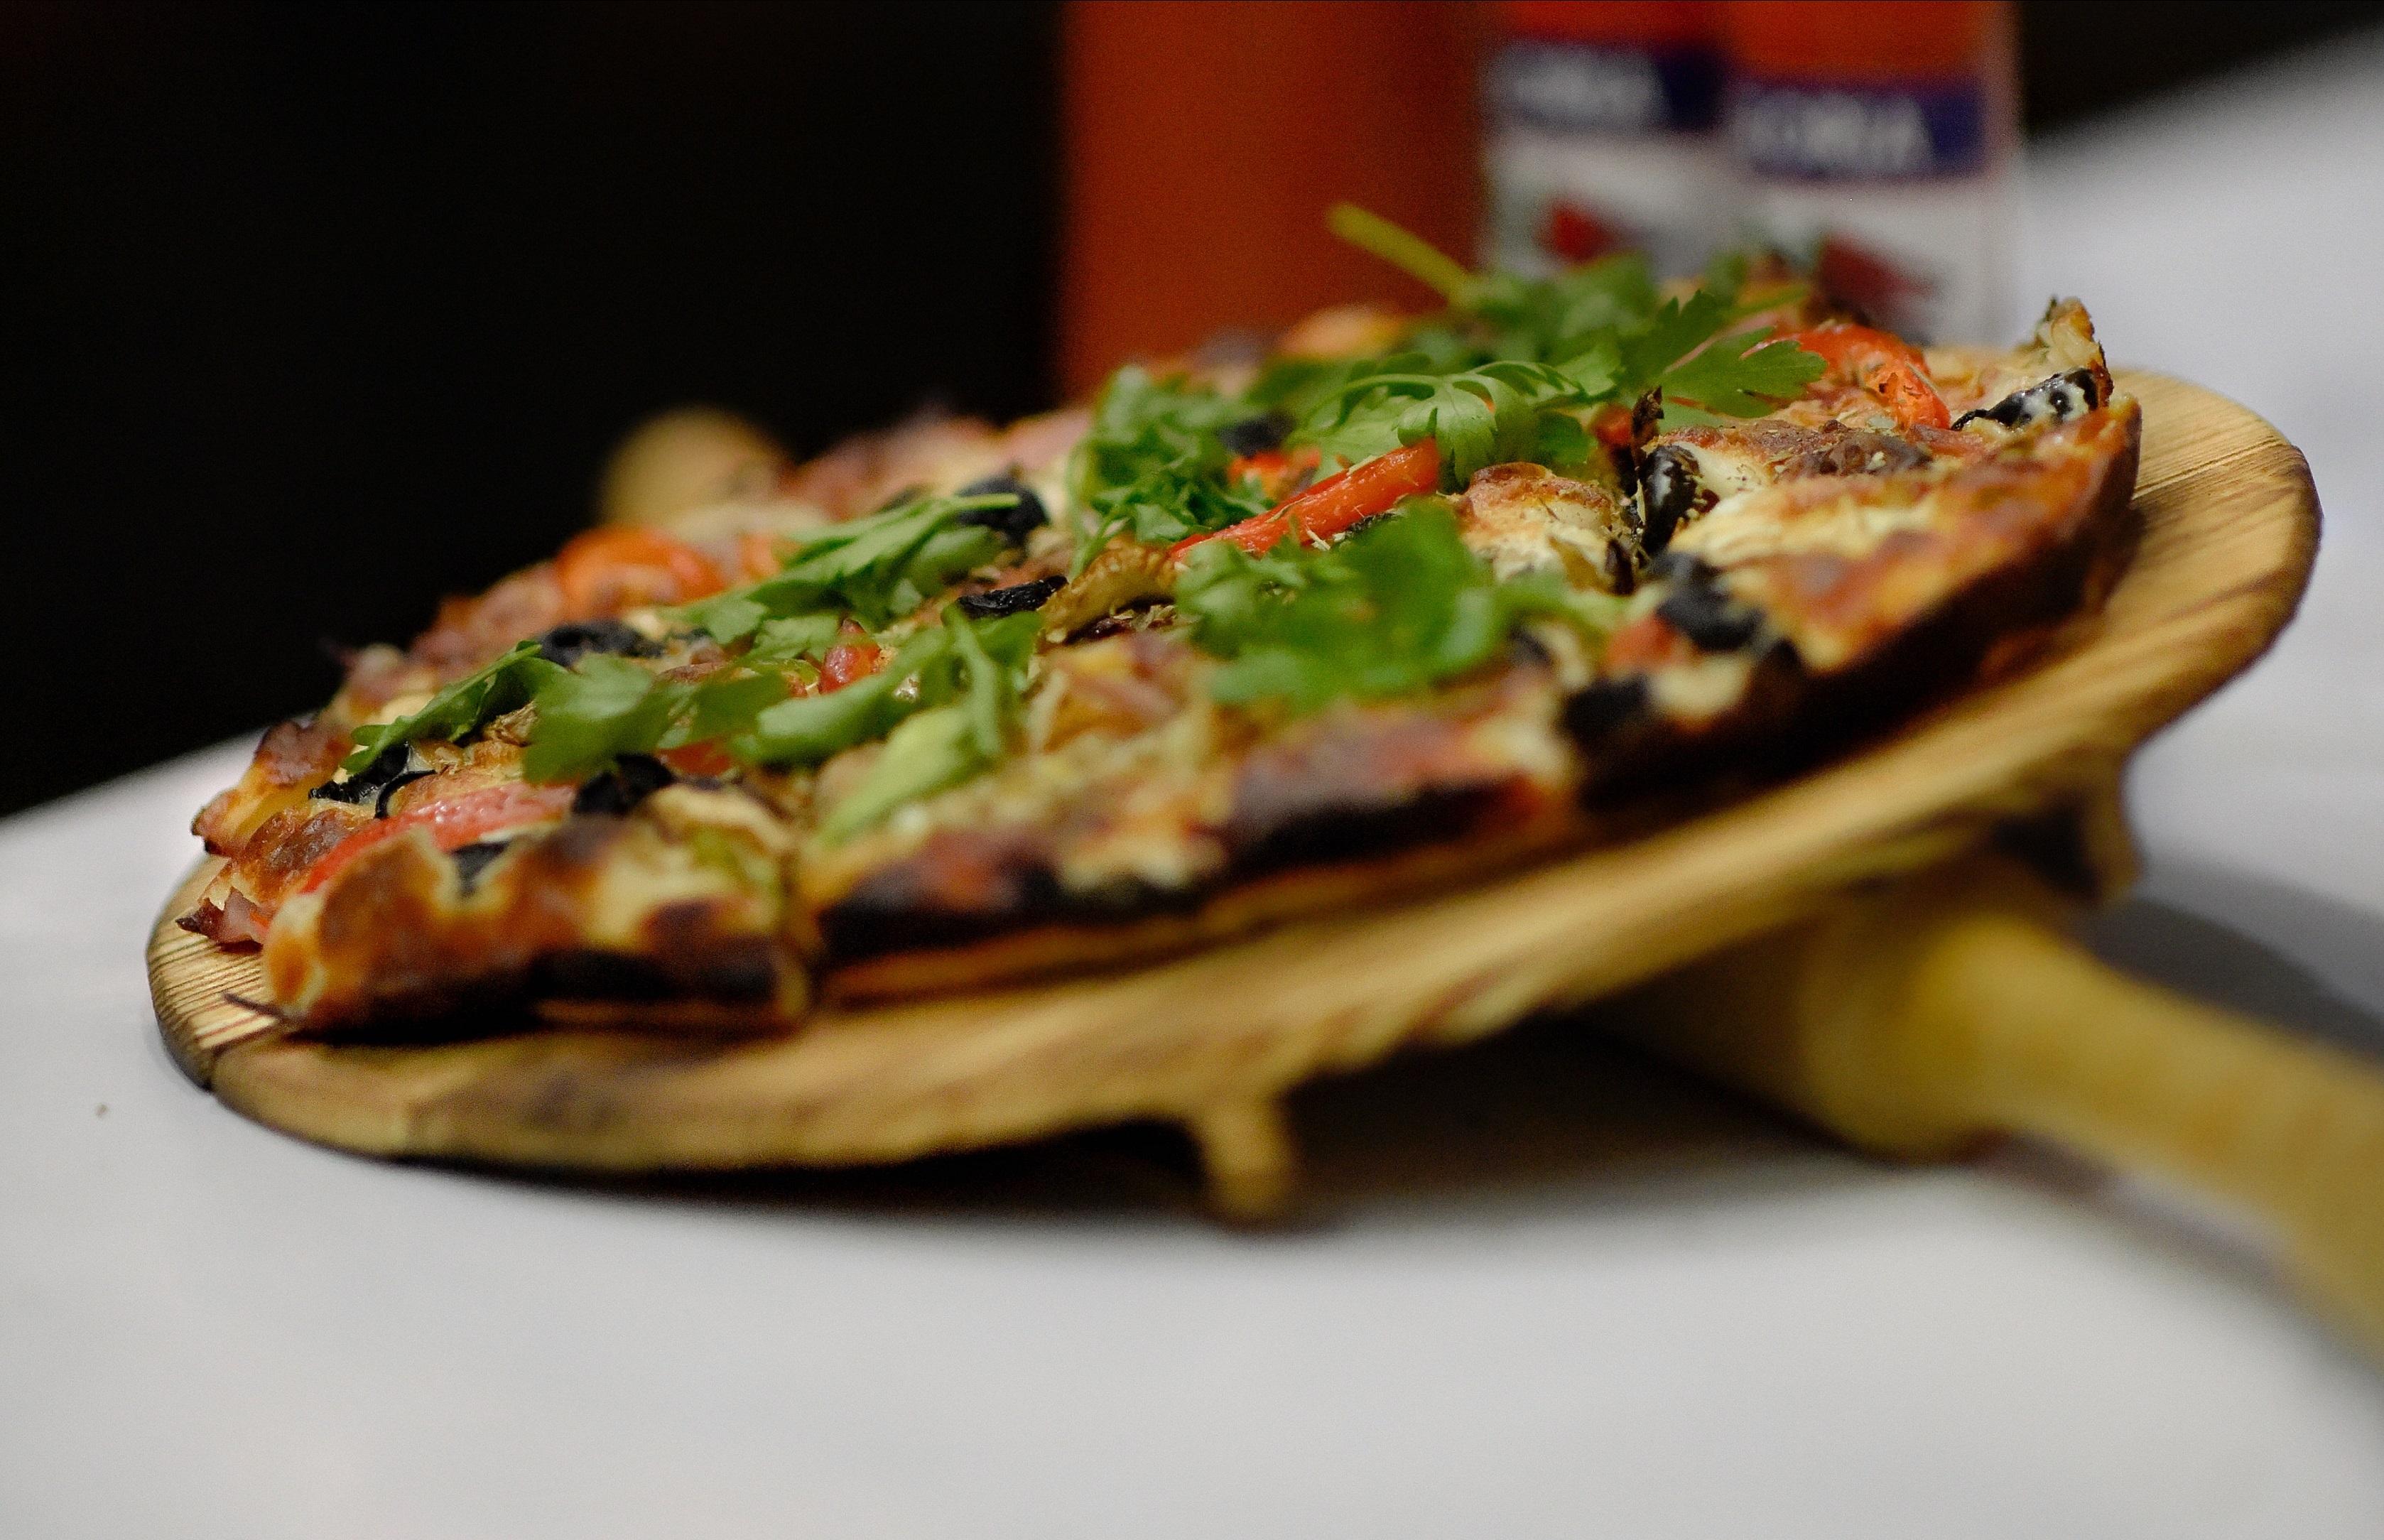 pizza casei - sfatulaprintilor.ro - bahram-bayat-1170409-unsplash